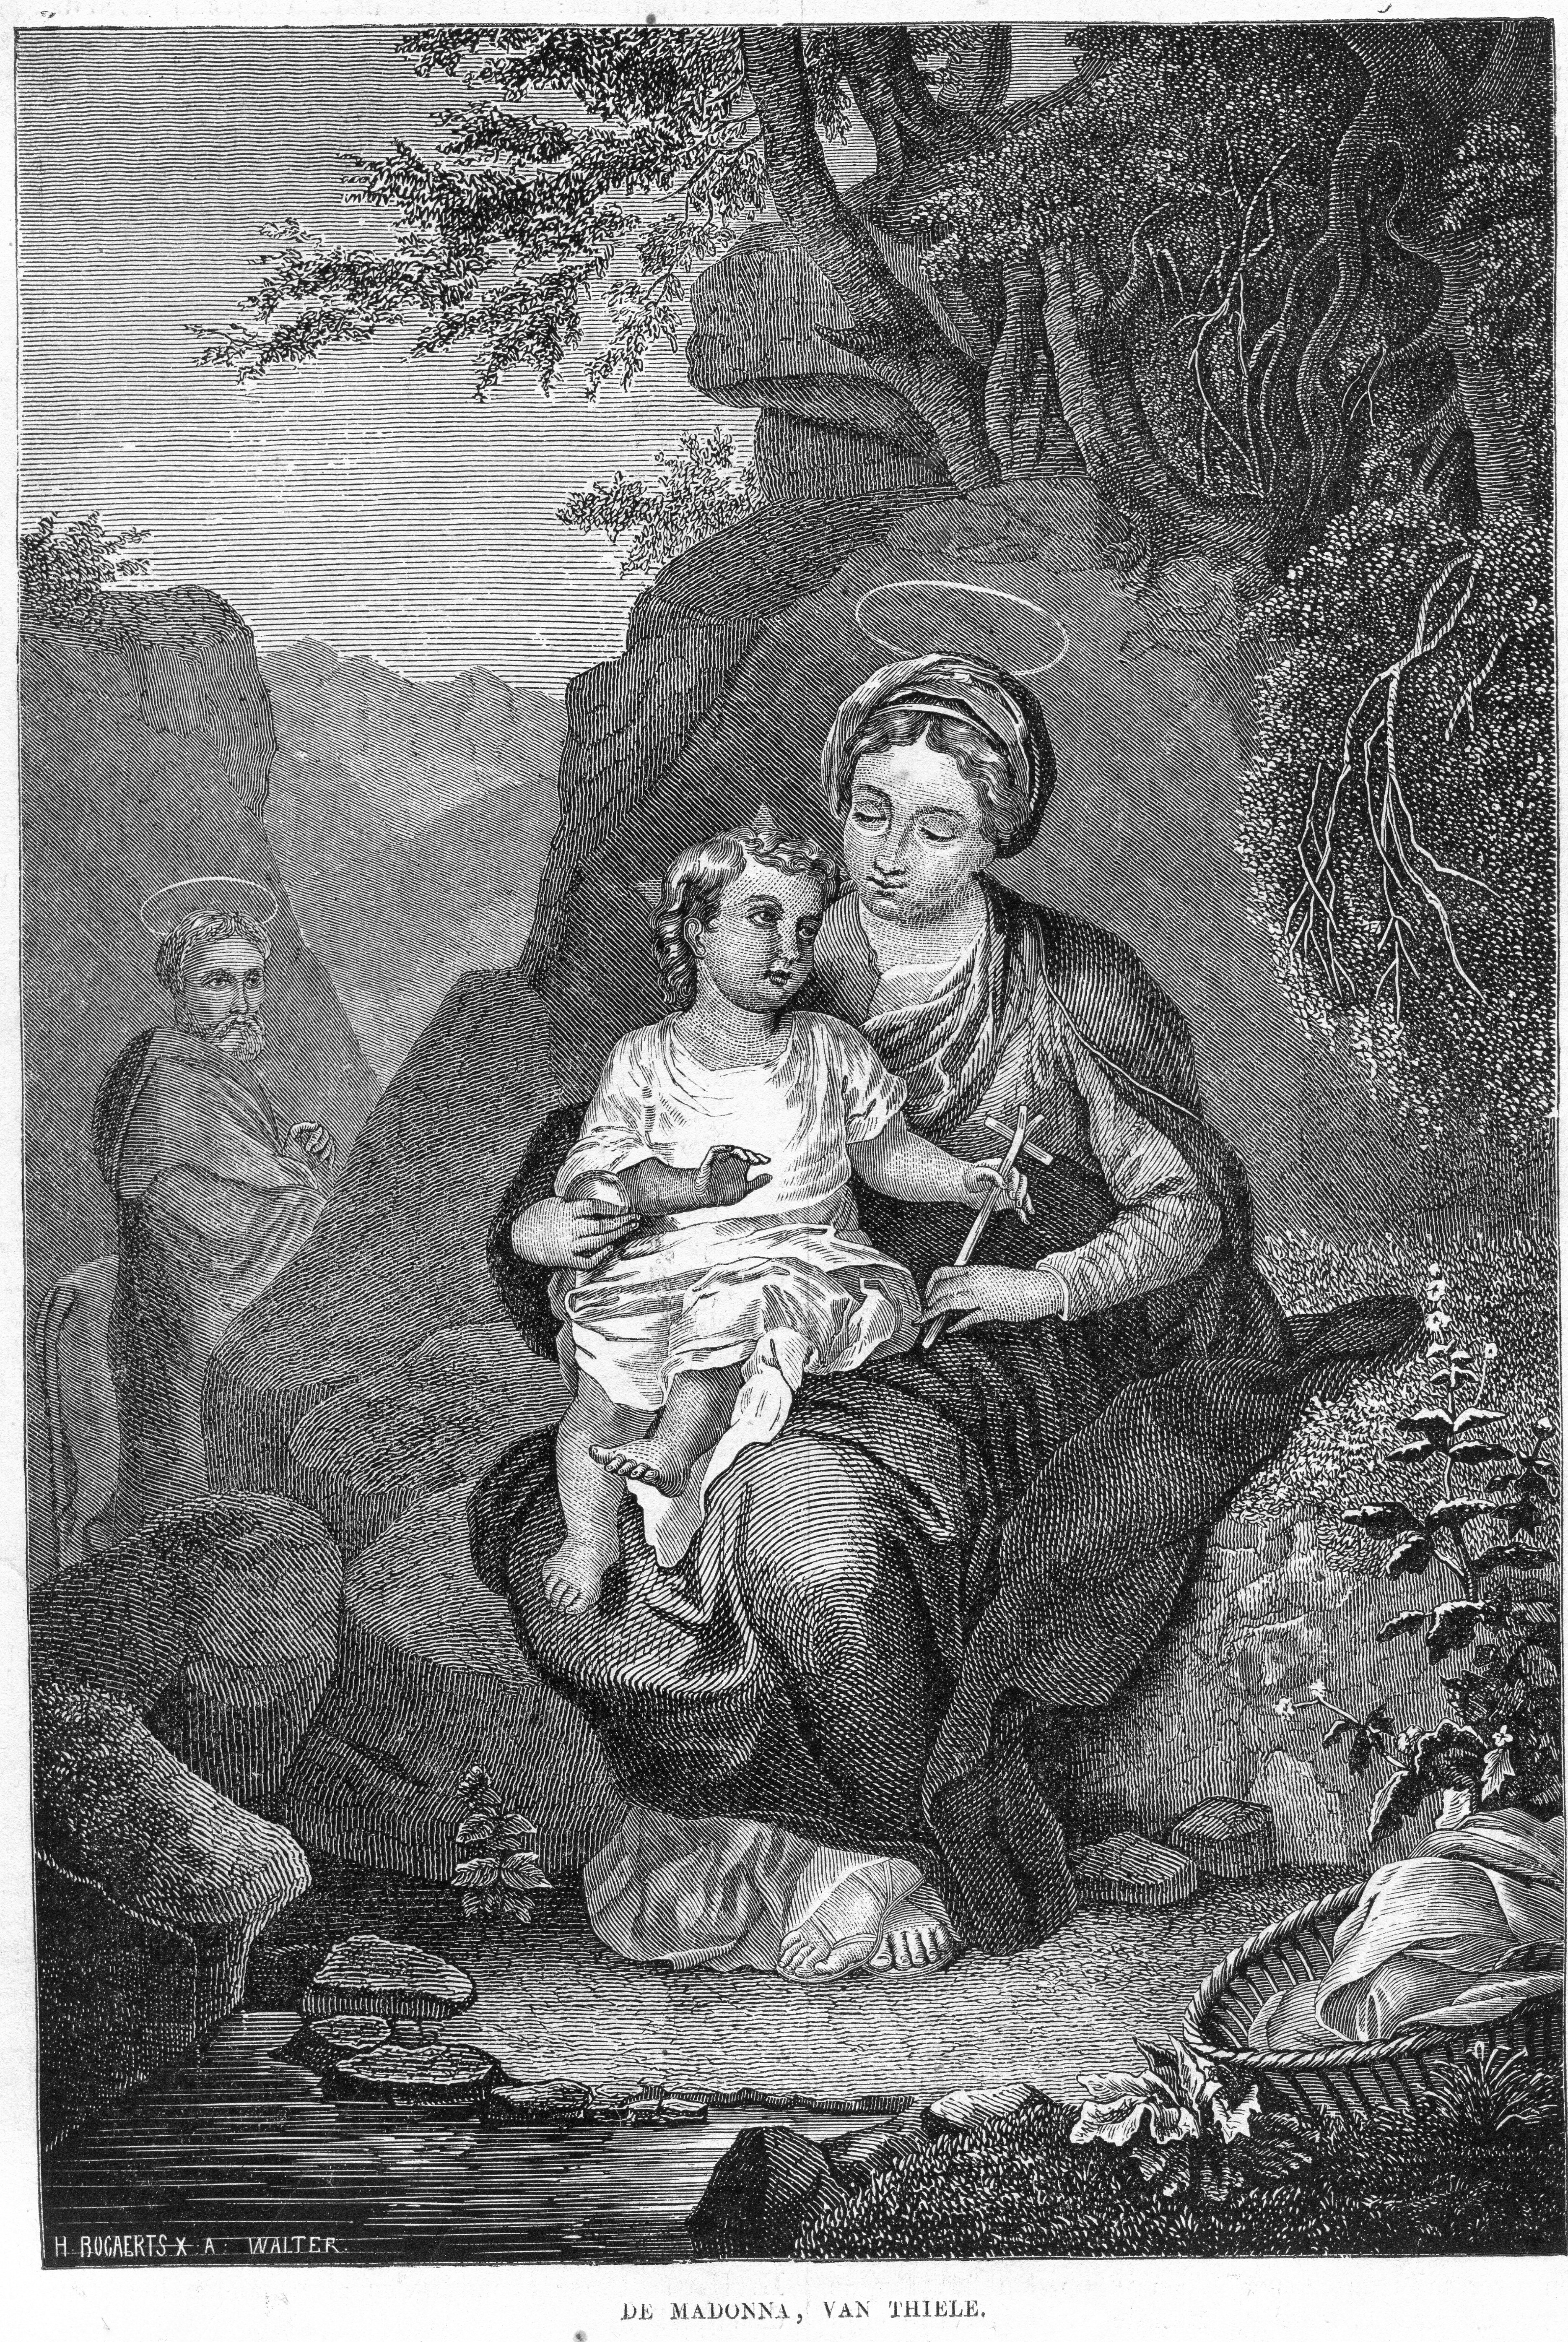 3efadefe9b02 File Katholieke Illustratie 1869-1870 nr 19 p.152 De Madonna